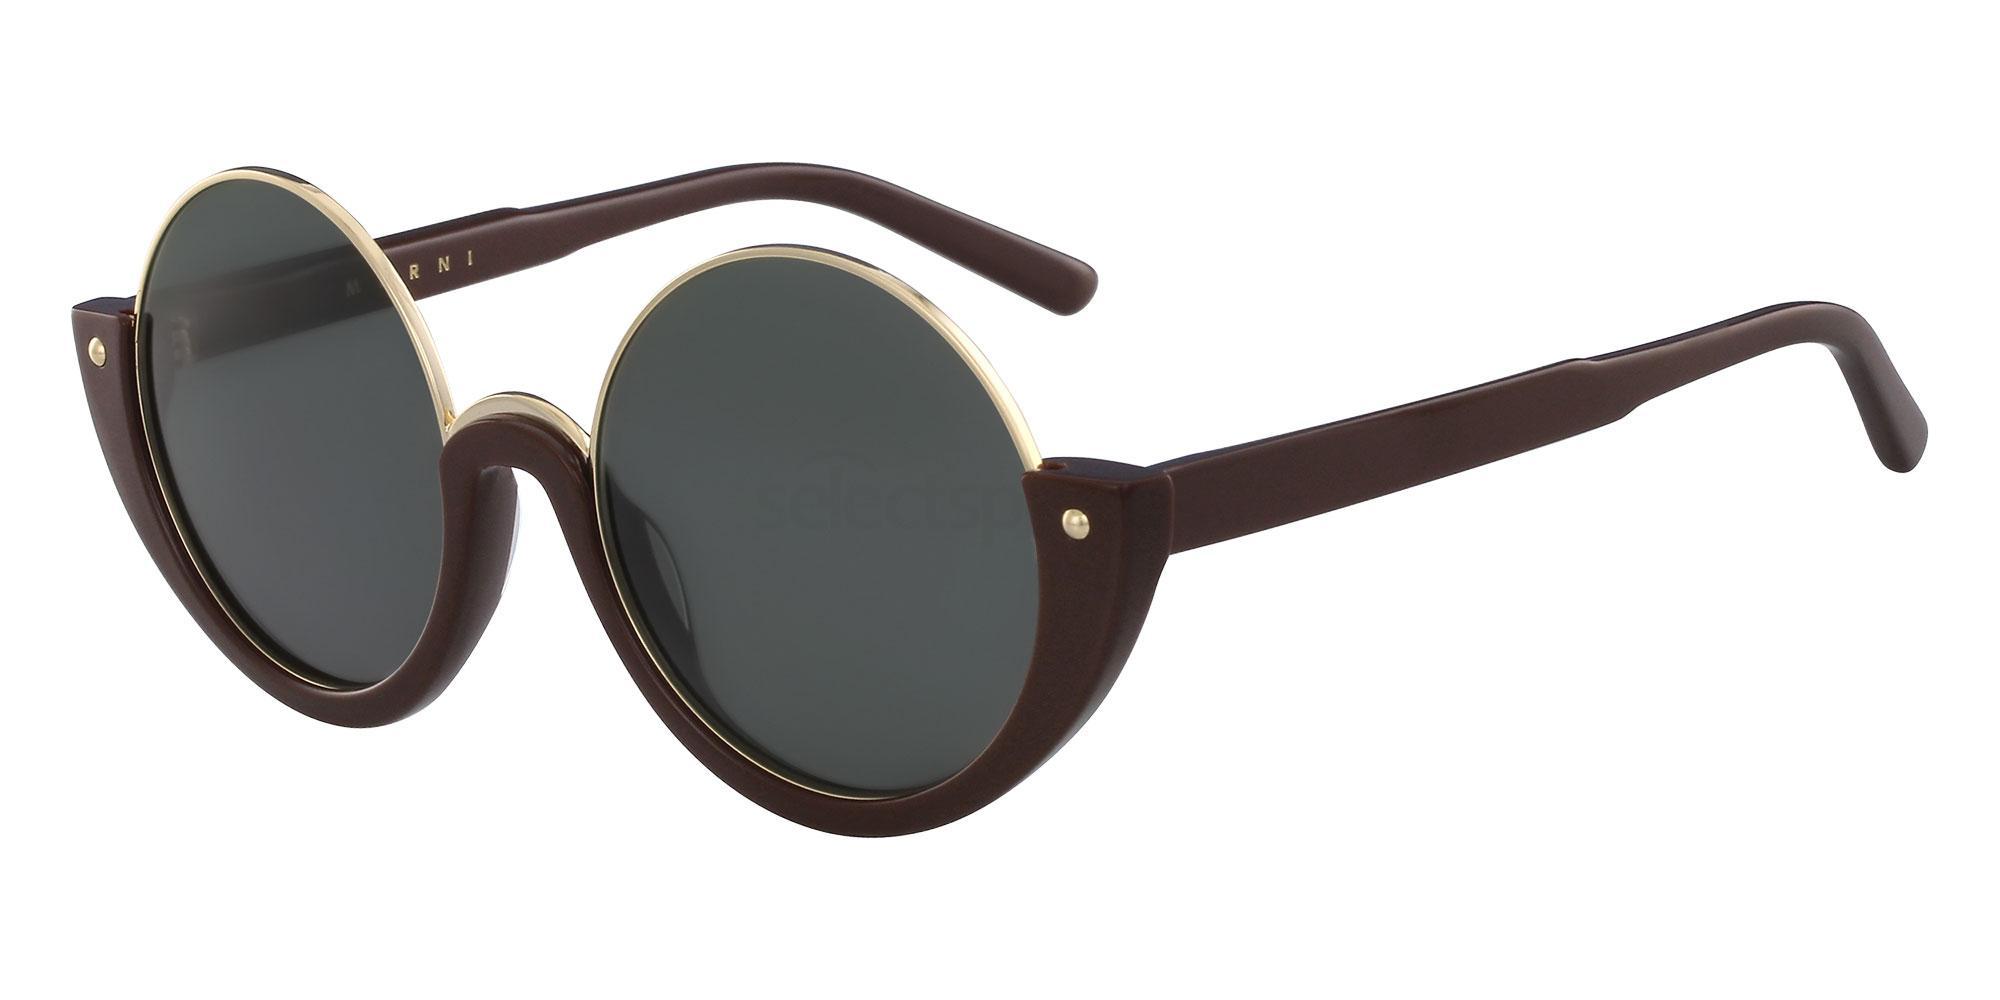 210 ME614S Sunglasses, Marni